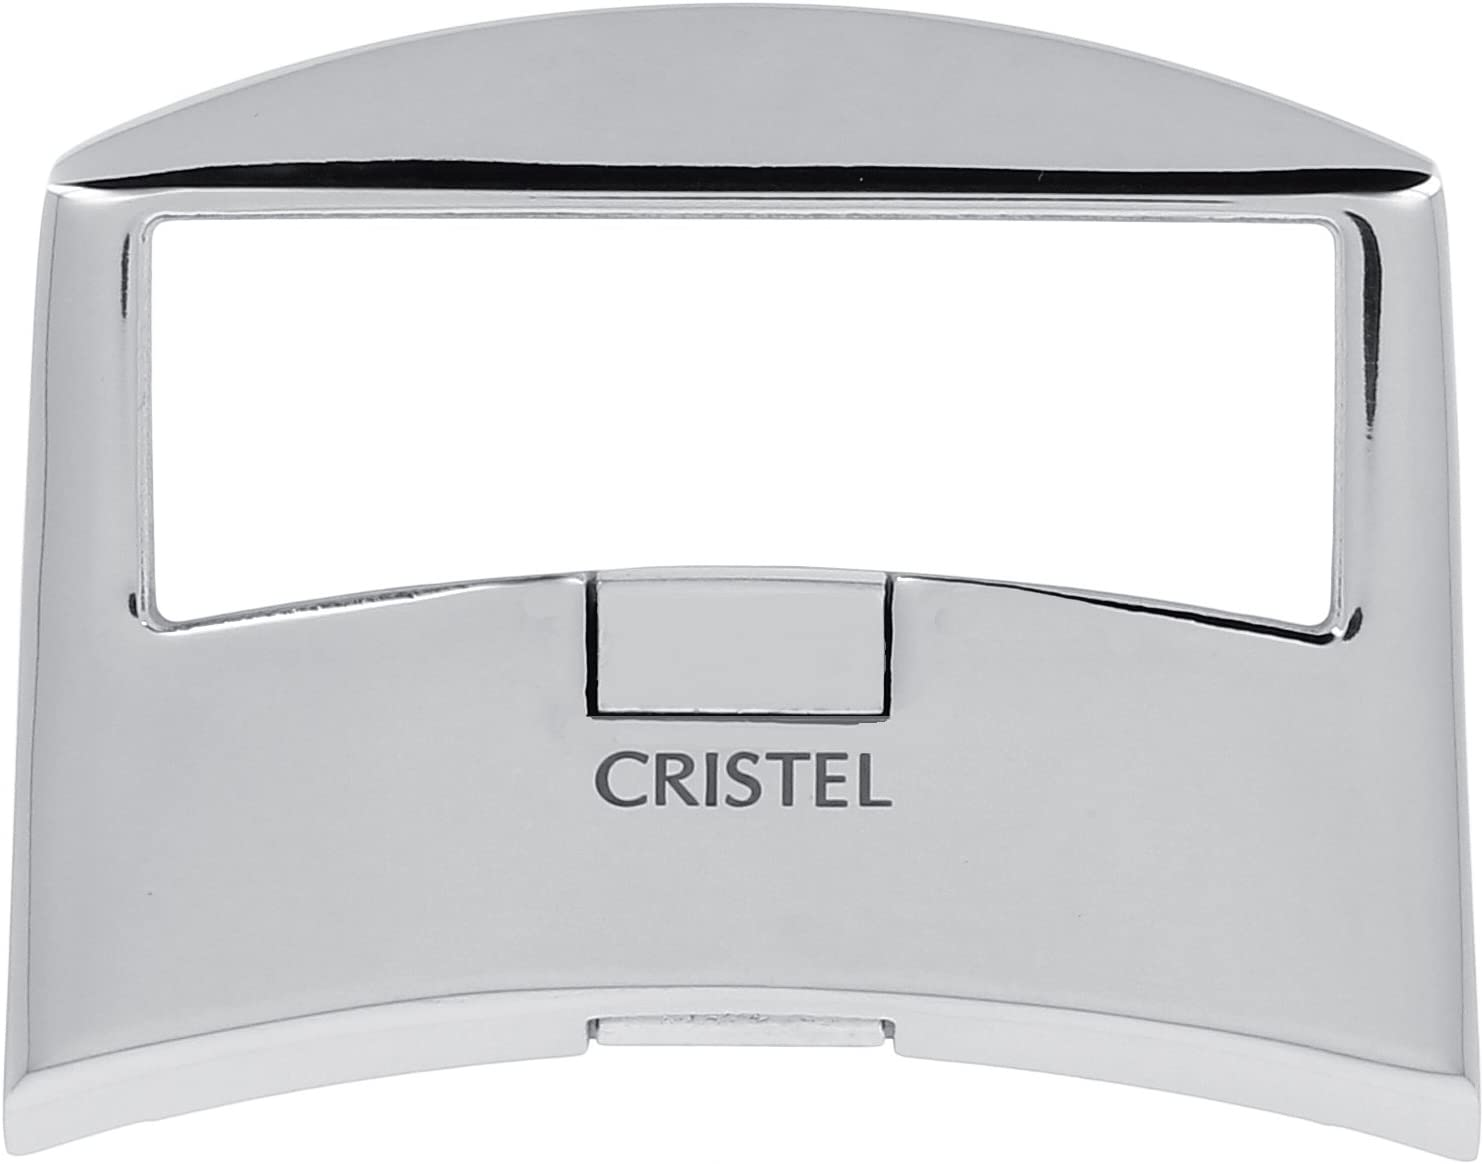 Cristel - ANSE Amovible CASTELINE INOX PLCX: Amazon.es: Hogar